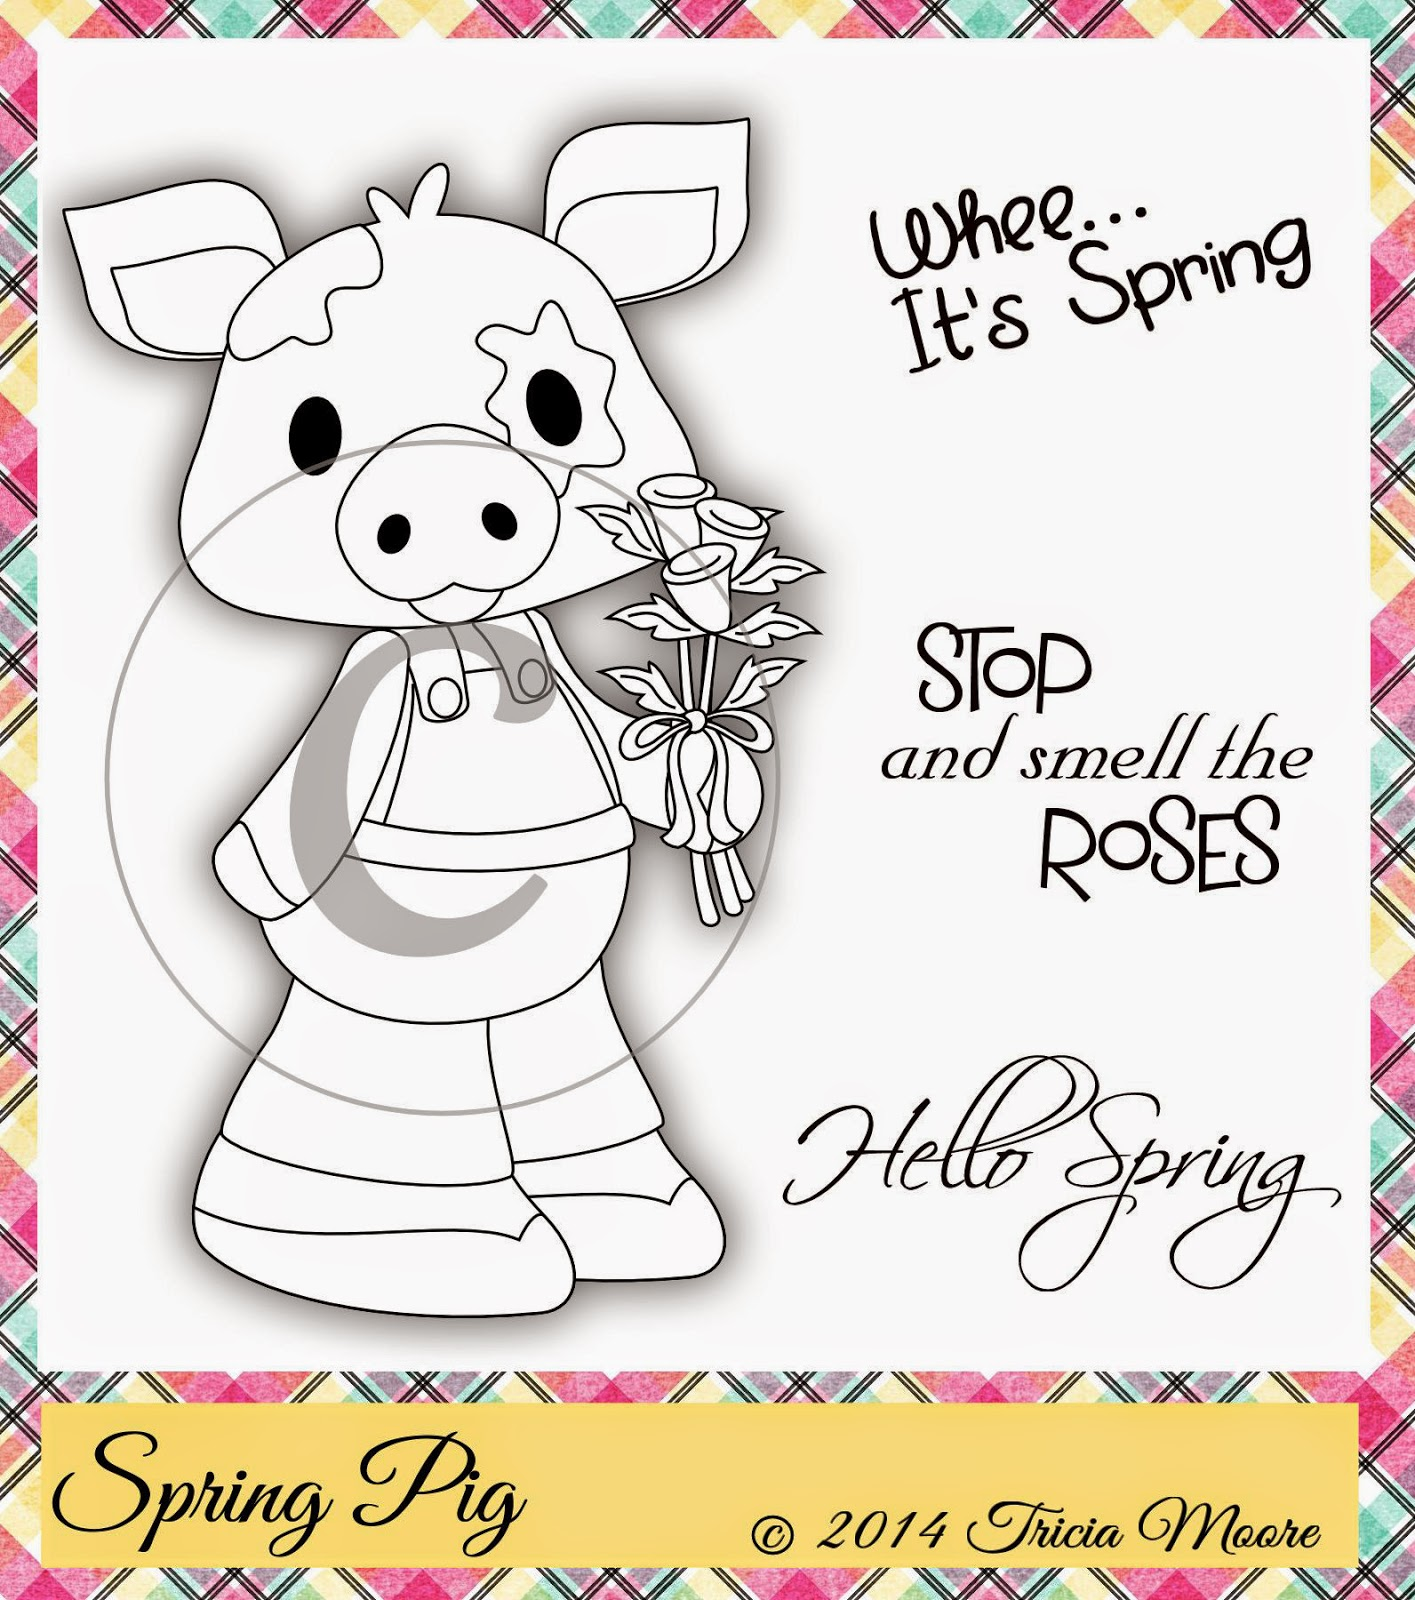 http://www.lshdigidesigns.com/item_46/ds-Spring-Pig-Digi-Stamp.htm